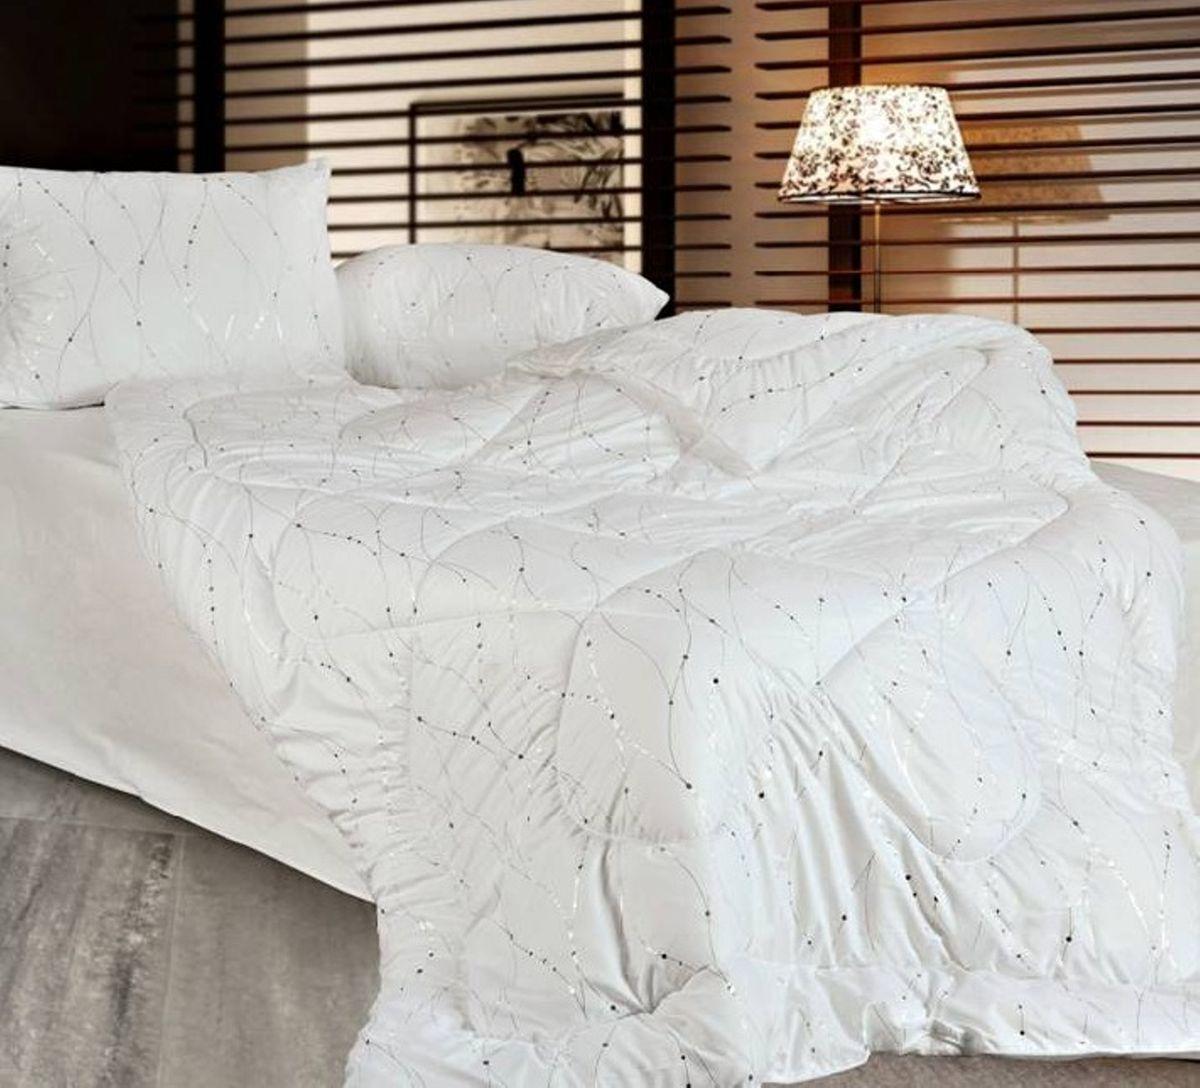 Подушка Home & Style, наполнитель: соевое волокно, 70 х 70 см подушка green line лен наполнитель льняное волокно 70 х 70 см